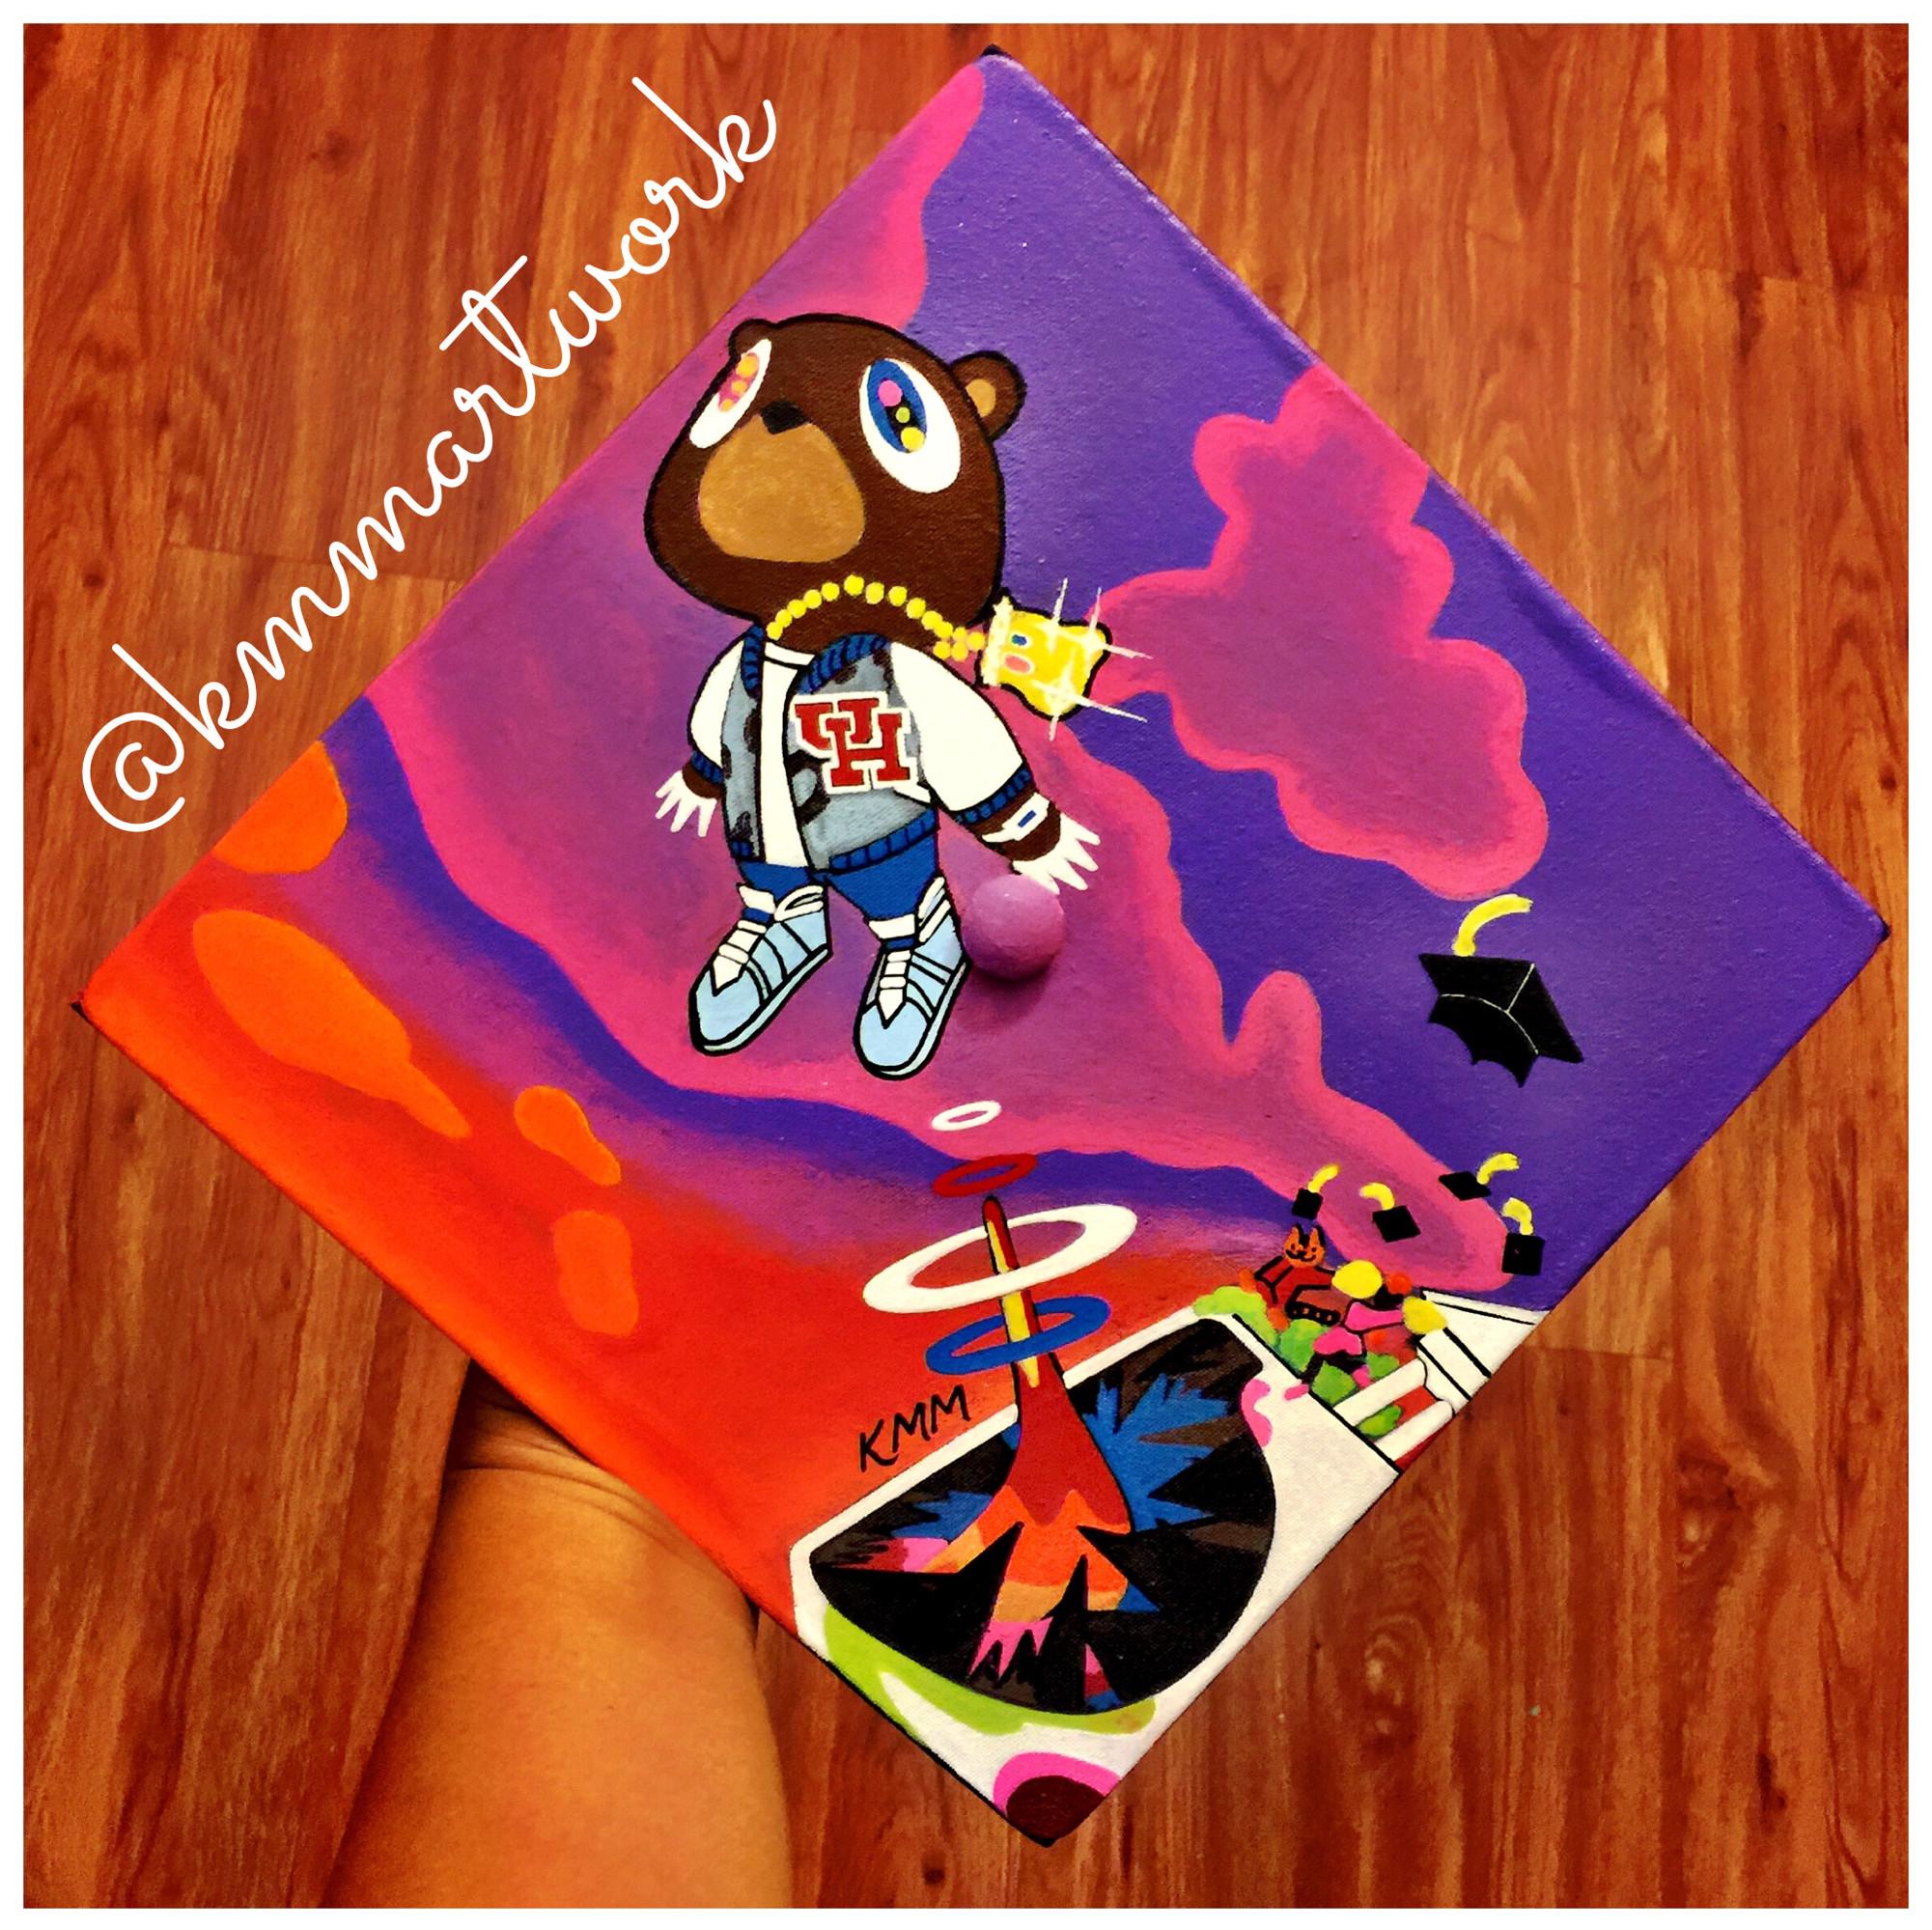 Graduation Cap – Kanye West Graduation Album Cover – University of Houston  – KMM Artwork –